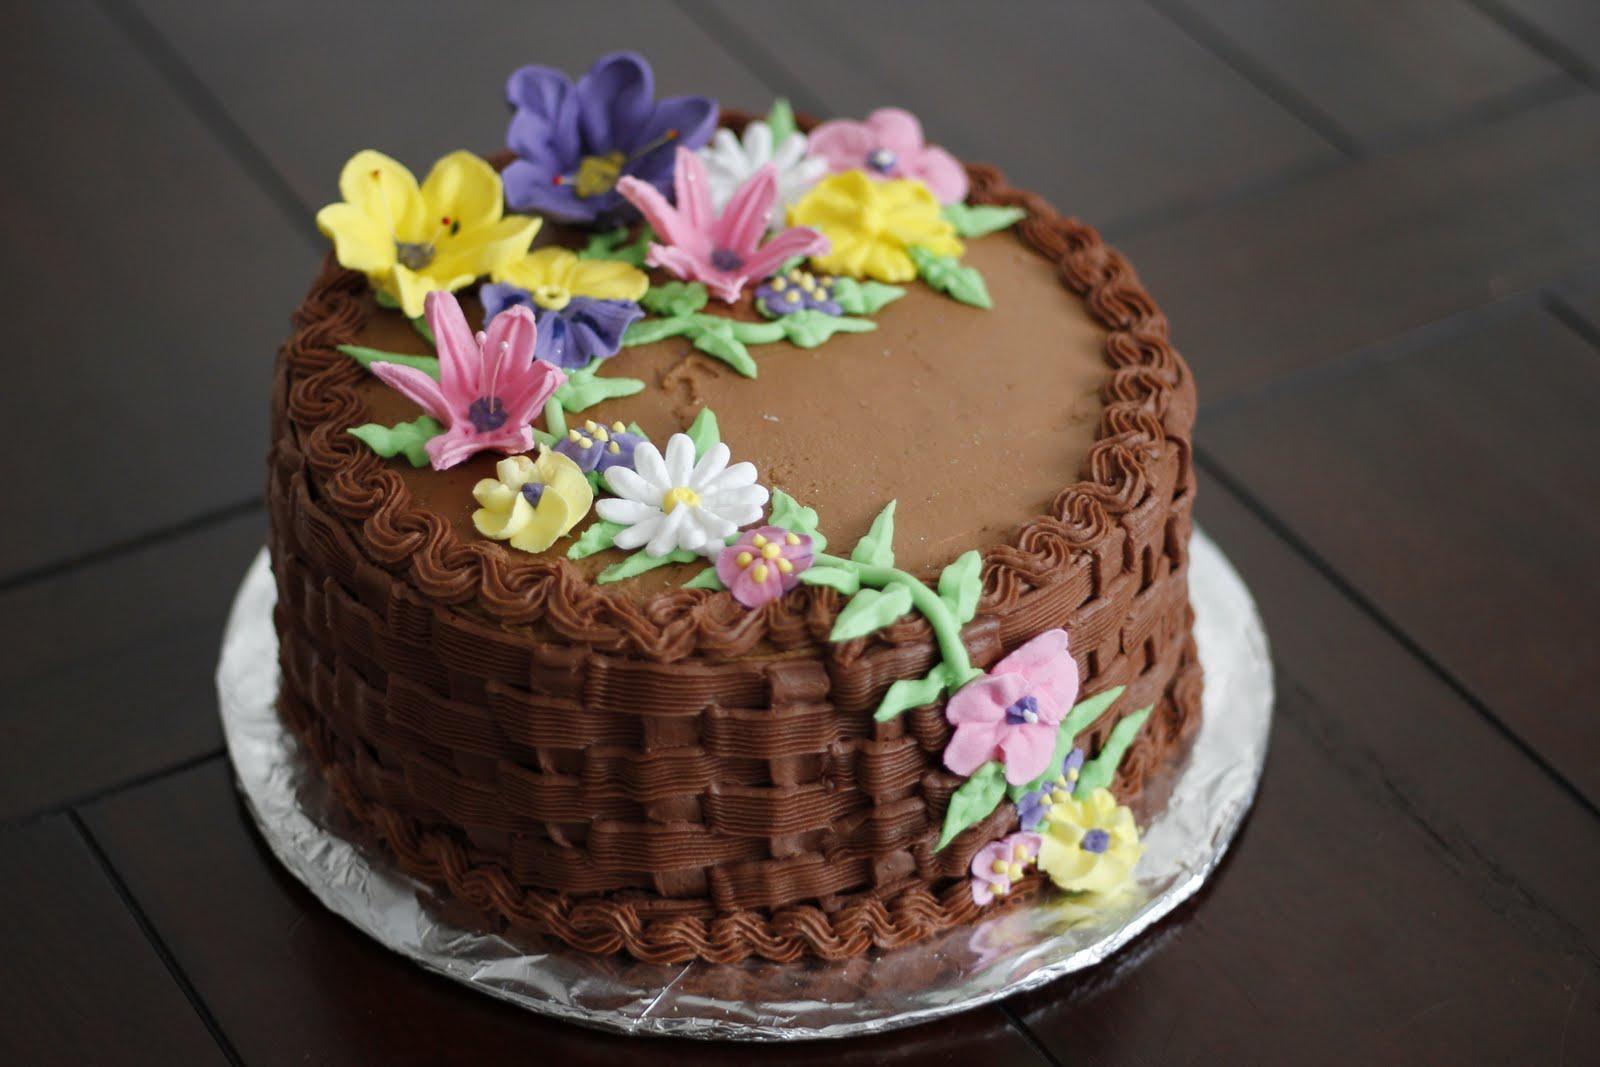 Sweet Cakes & Hone...